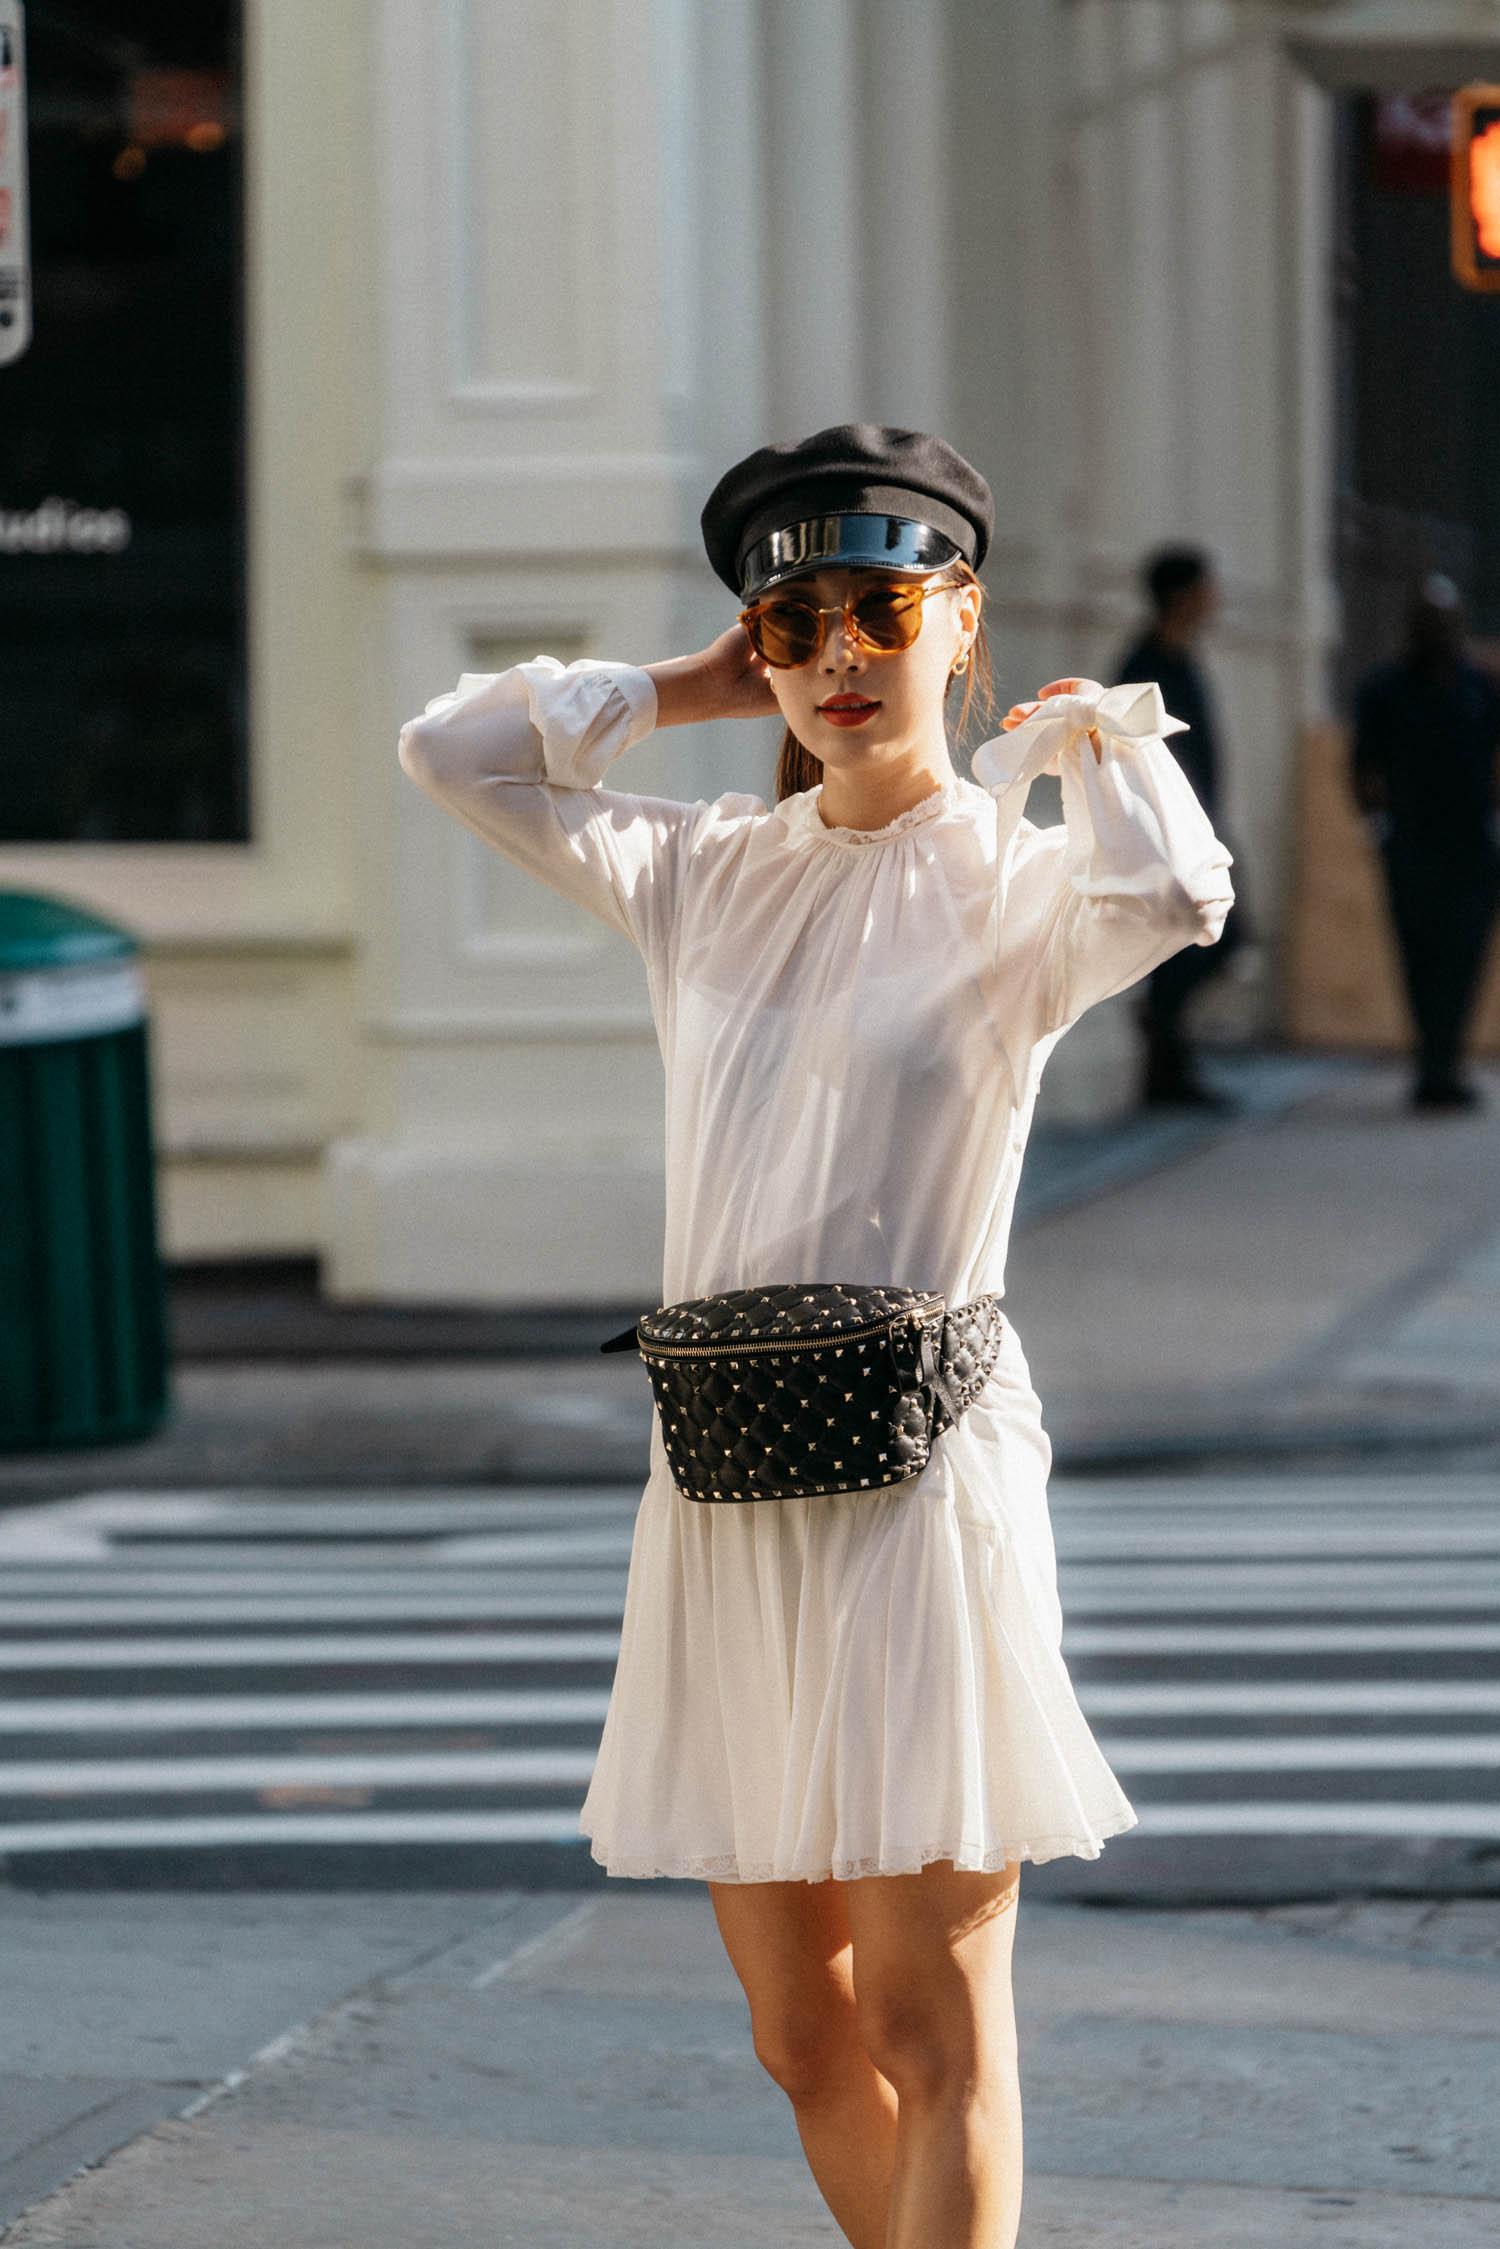 Prada Dress,  Fendi Sn  e  akers ,  Valentino Bag , Gucci Hat,  Céline Sunglasses